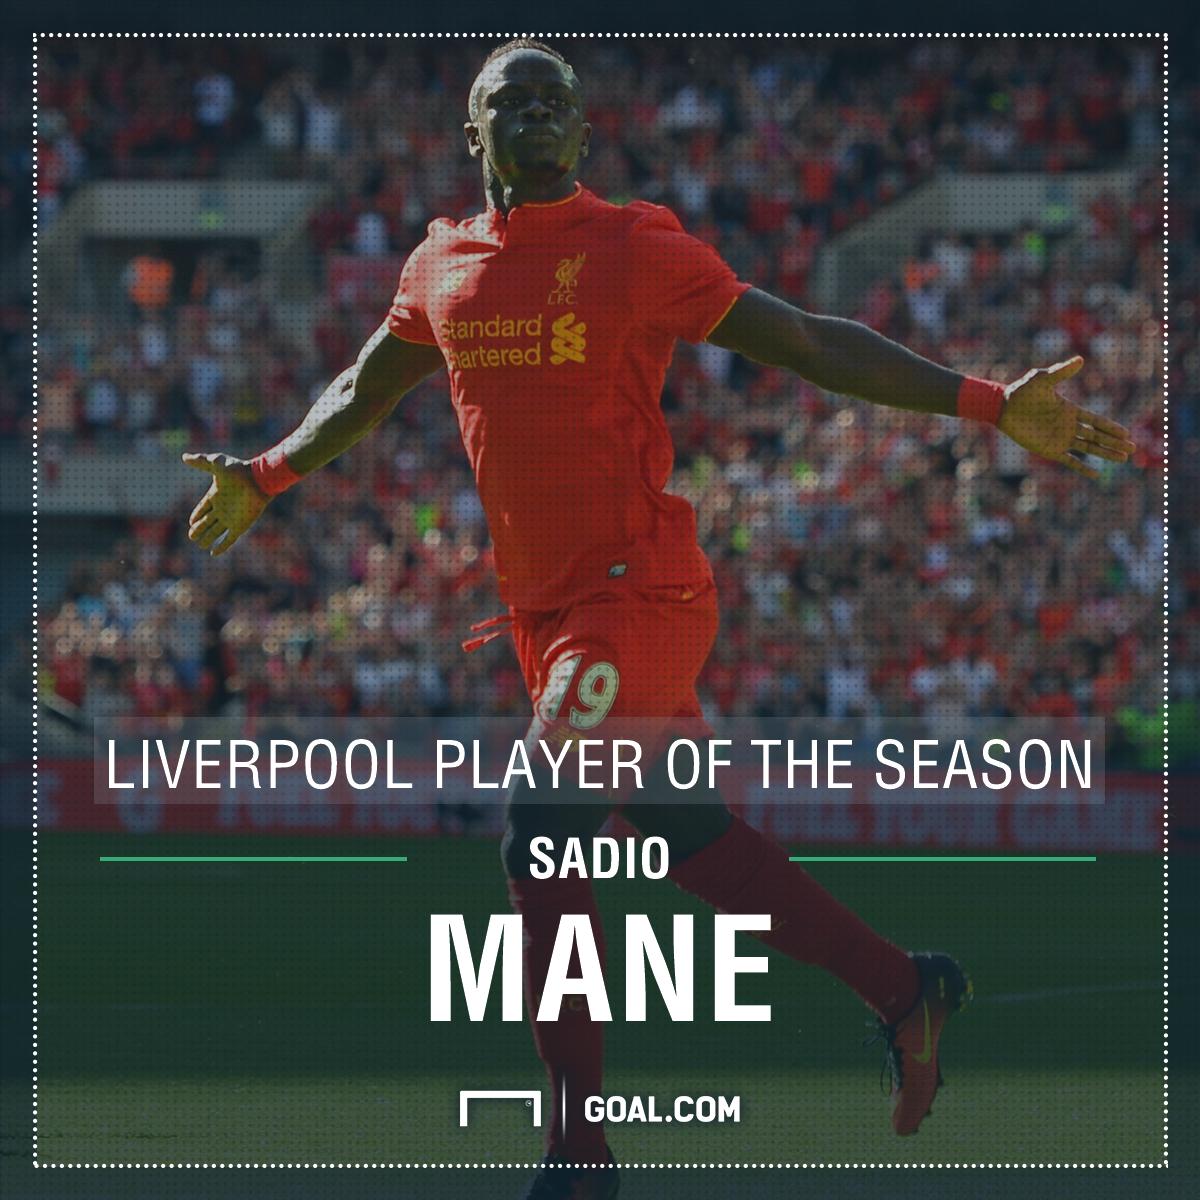 GFX Sadio Mane Liverpool Player of the Season